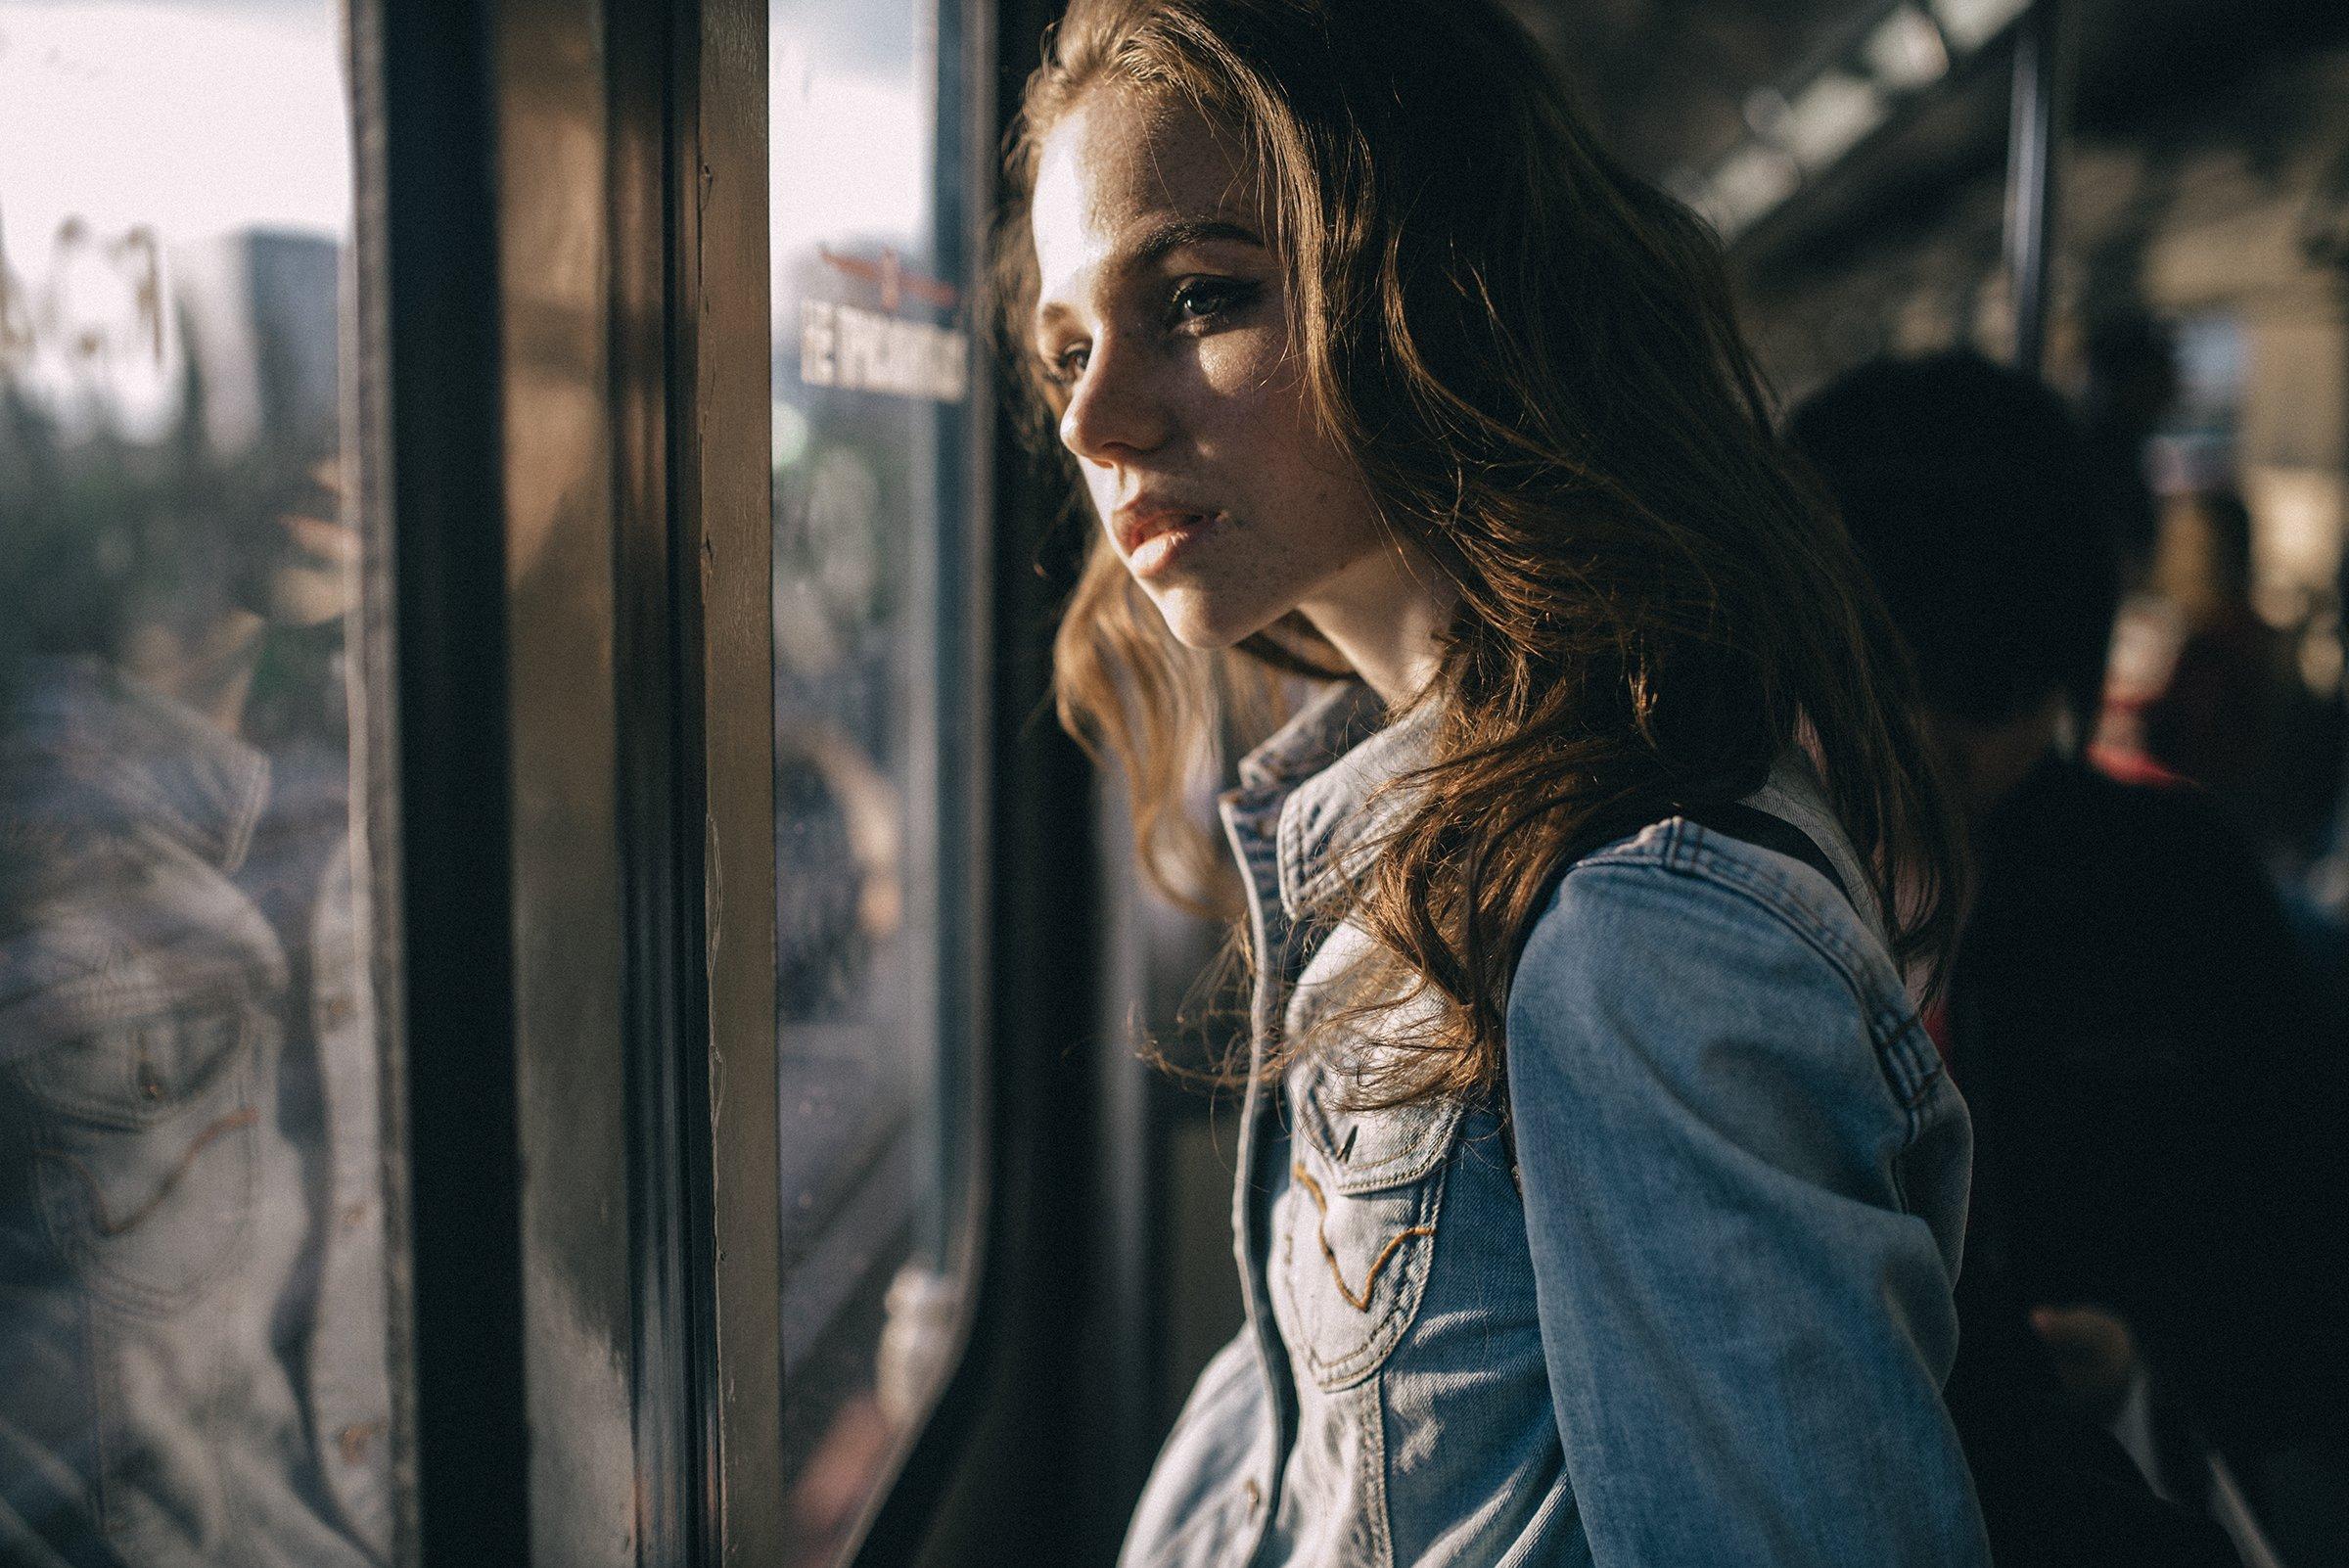 студент, студентка, поезд, вагон, метро, солнце, стекло, окно, девушка, женщина, рюкзак, Kirill